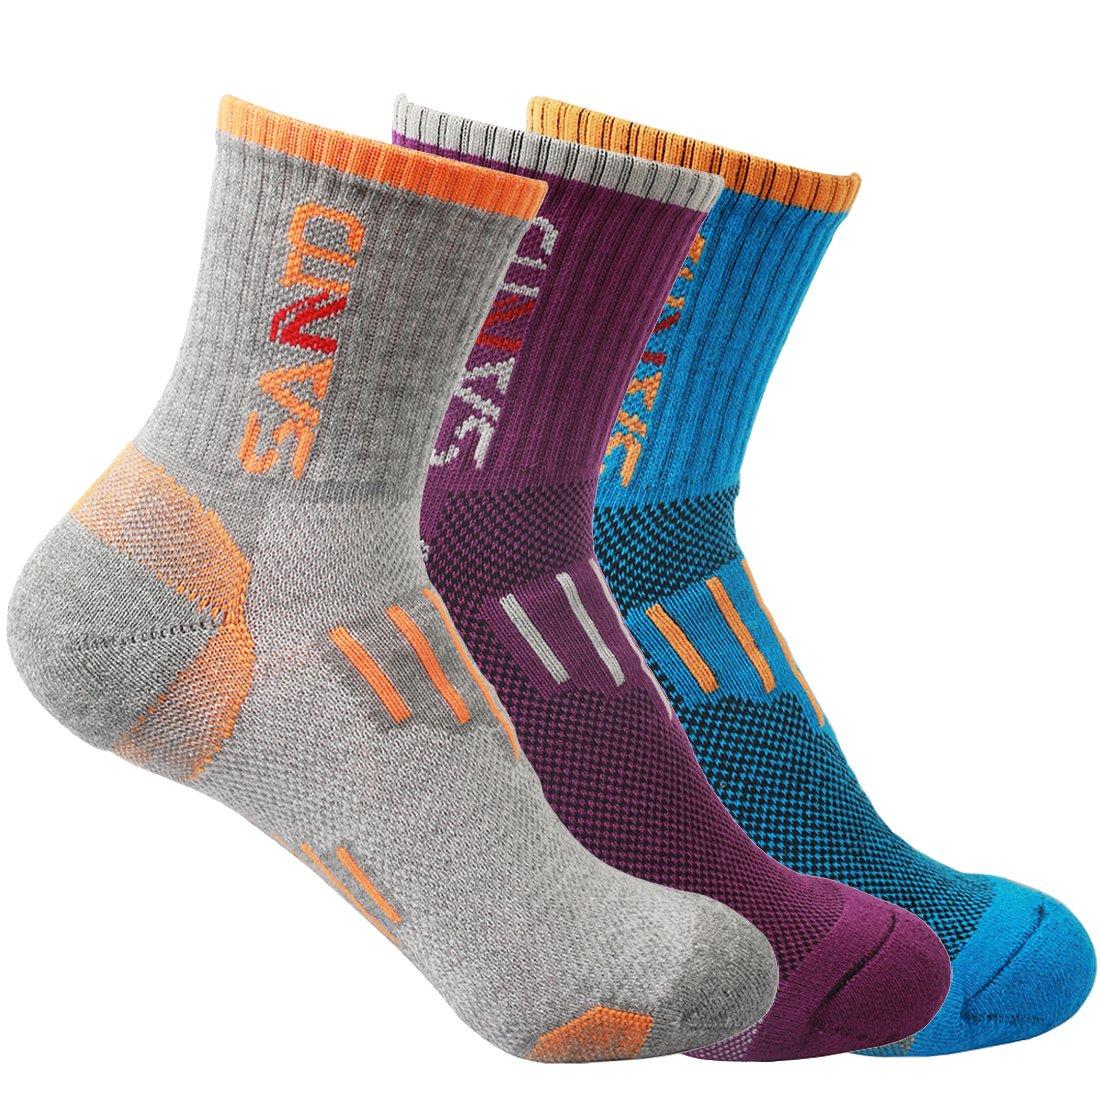 Women Crew Socks for Running Trekking Hiking Biking Climbing Quick Drying Breathable Athletic Sport Socks 3 Pairs(<7 US Size)